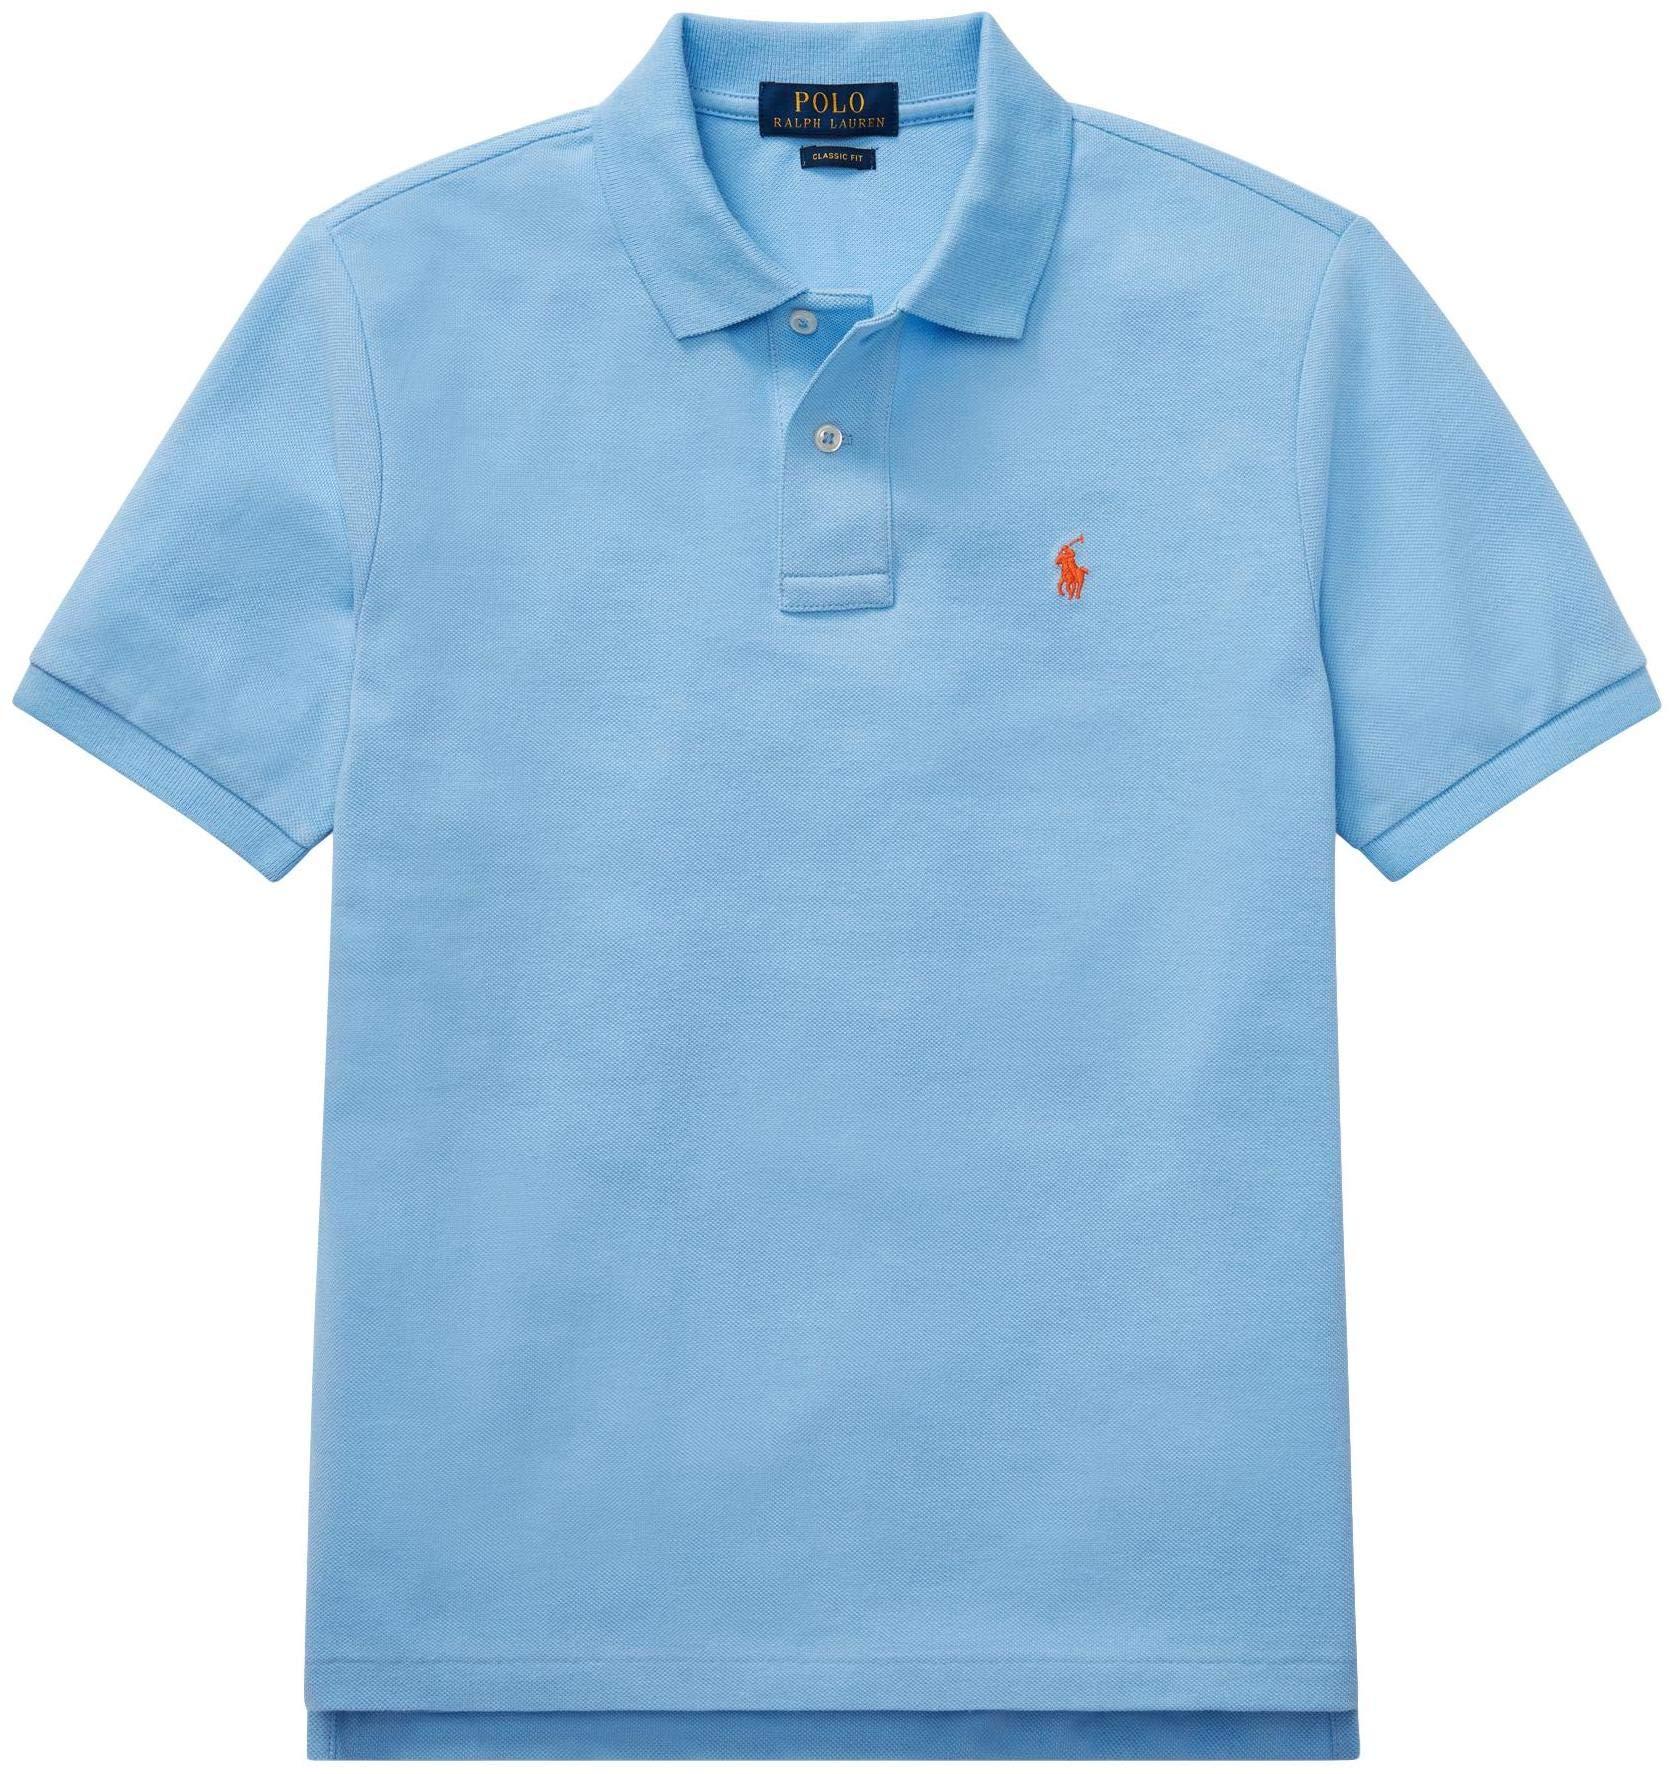 Ralph Lauren Polo Boys' Classic Cotton Mesh Polo Shirt (CollinBlue, S)